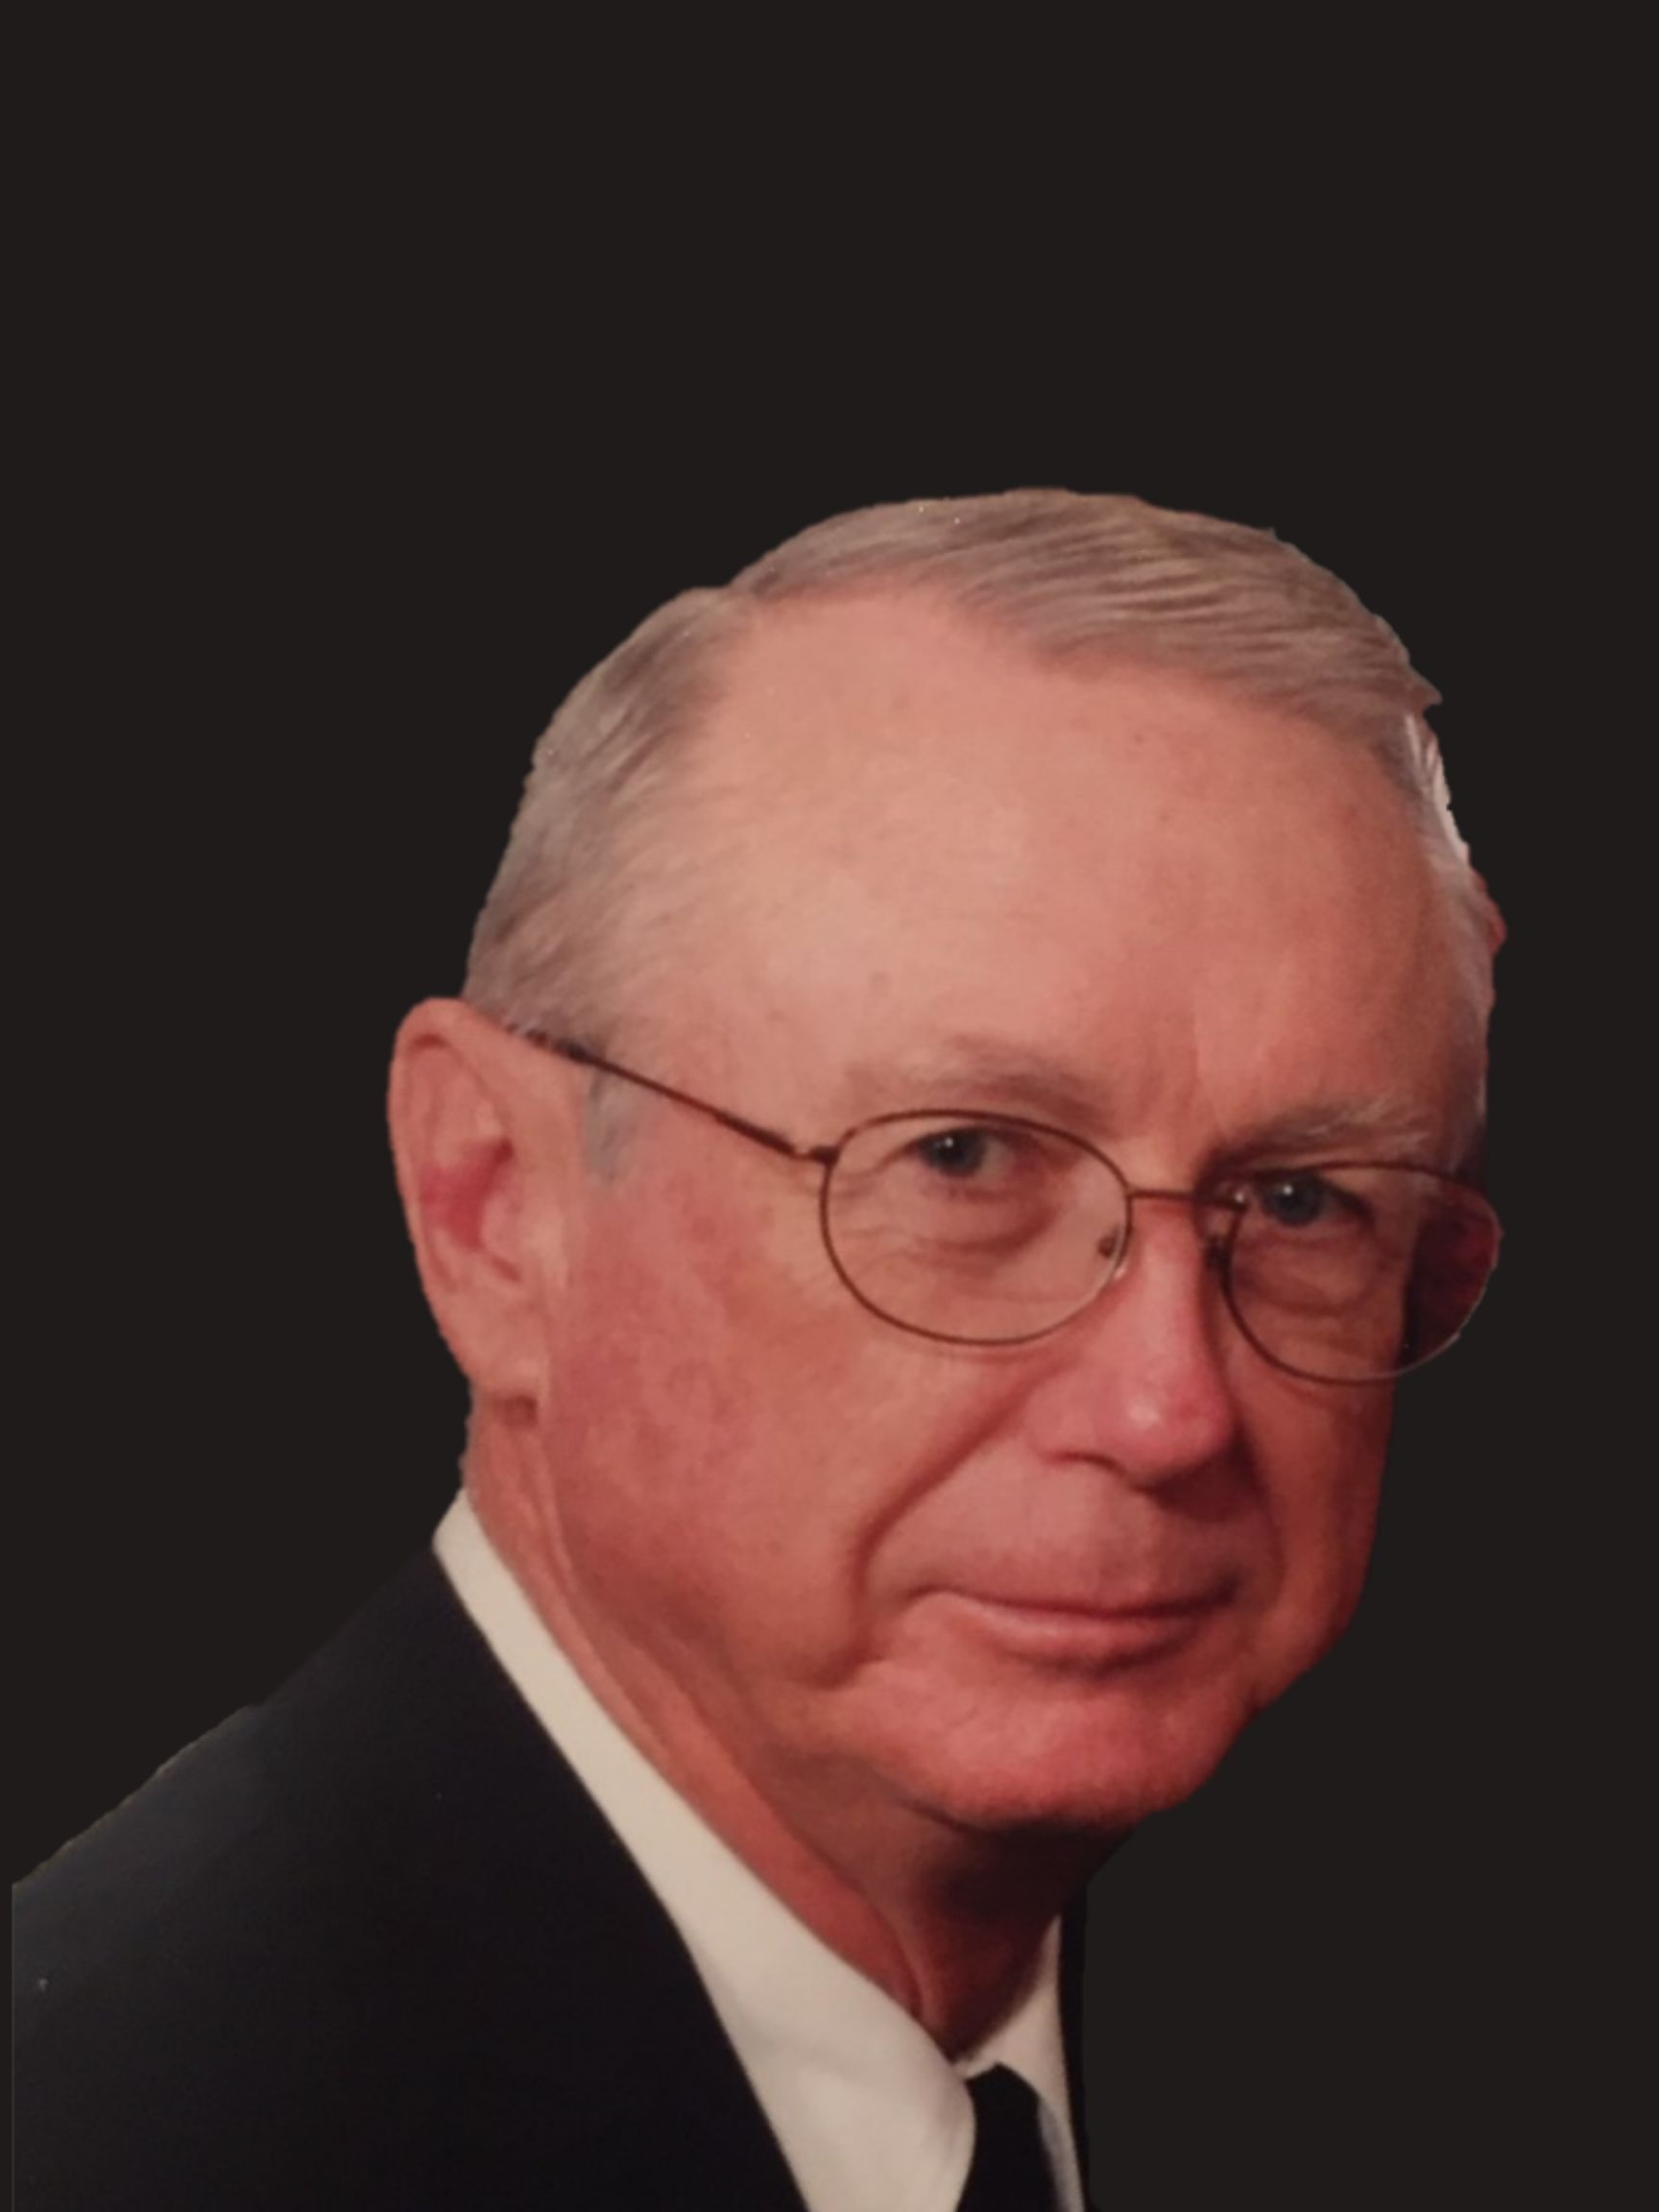 Dennis Mitchell McCuan